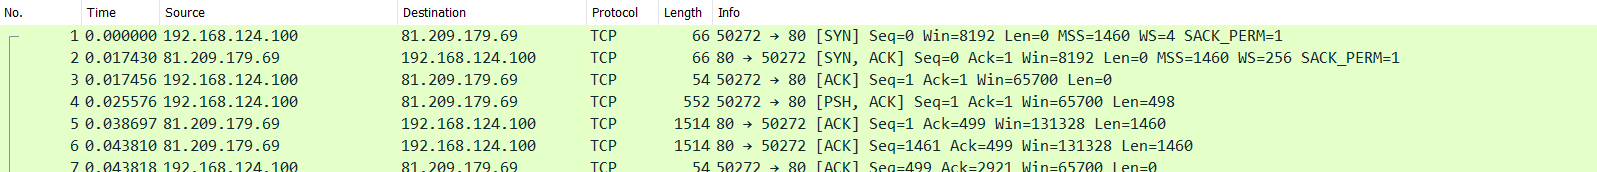 Wireshark Column Setup Deepdive | Packet-Foo | Network